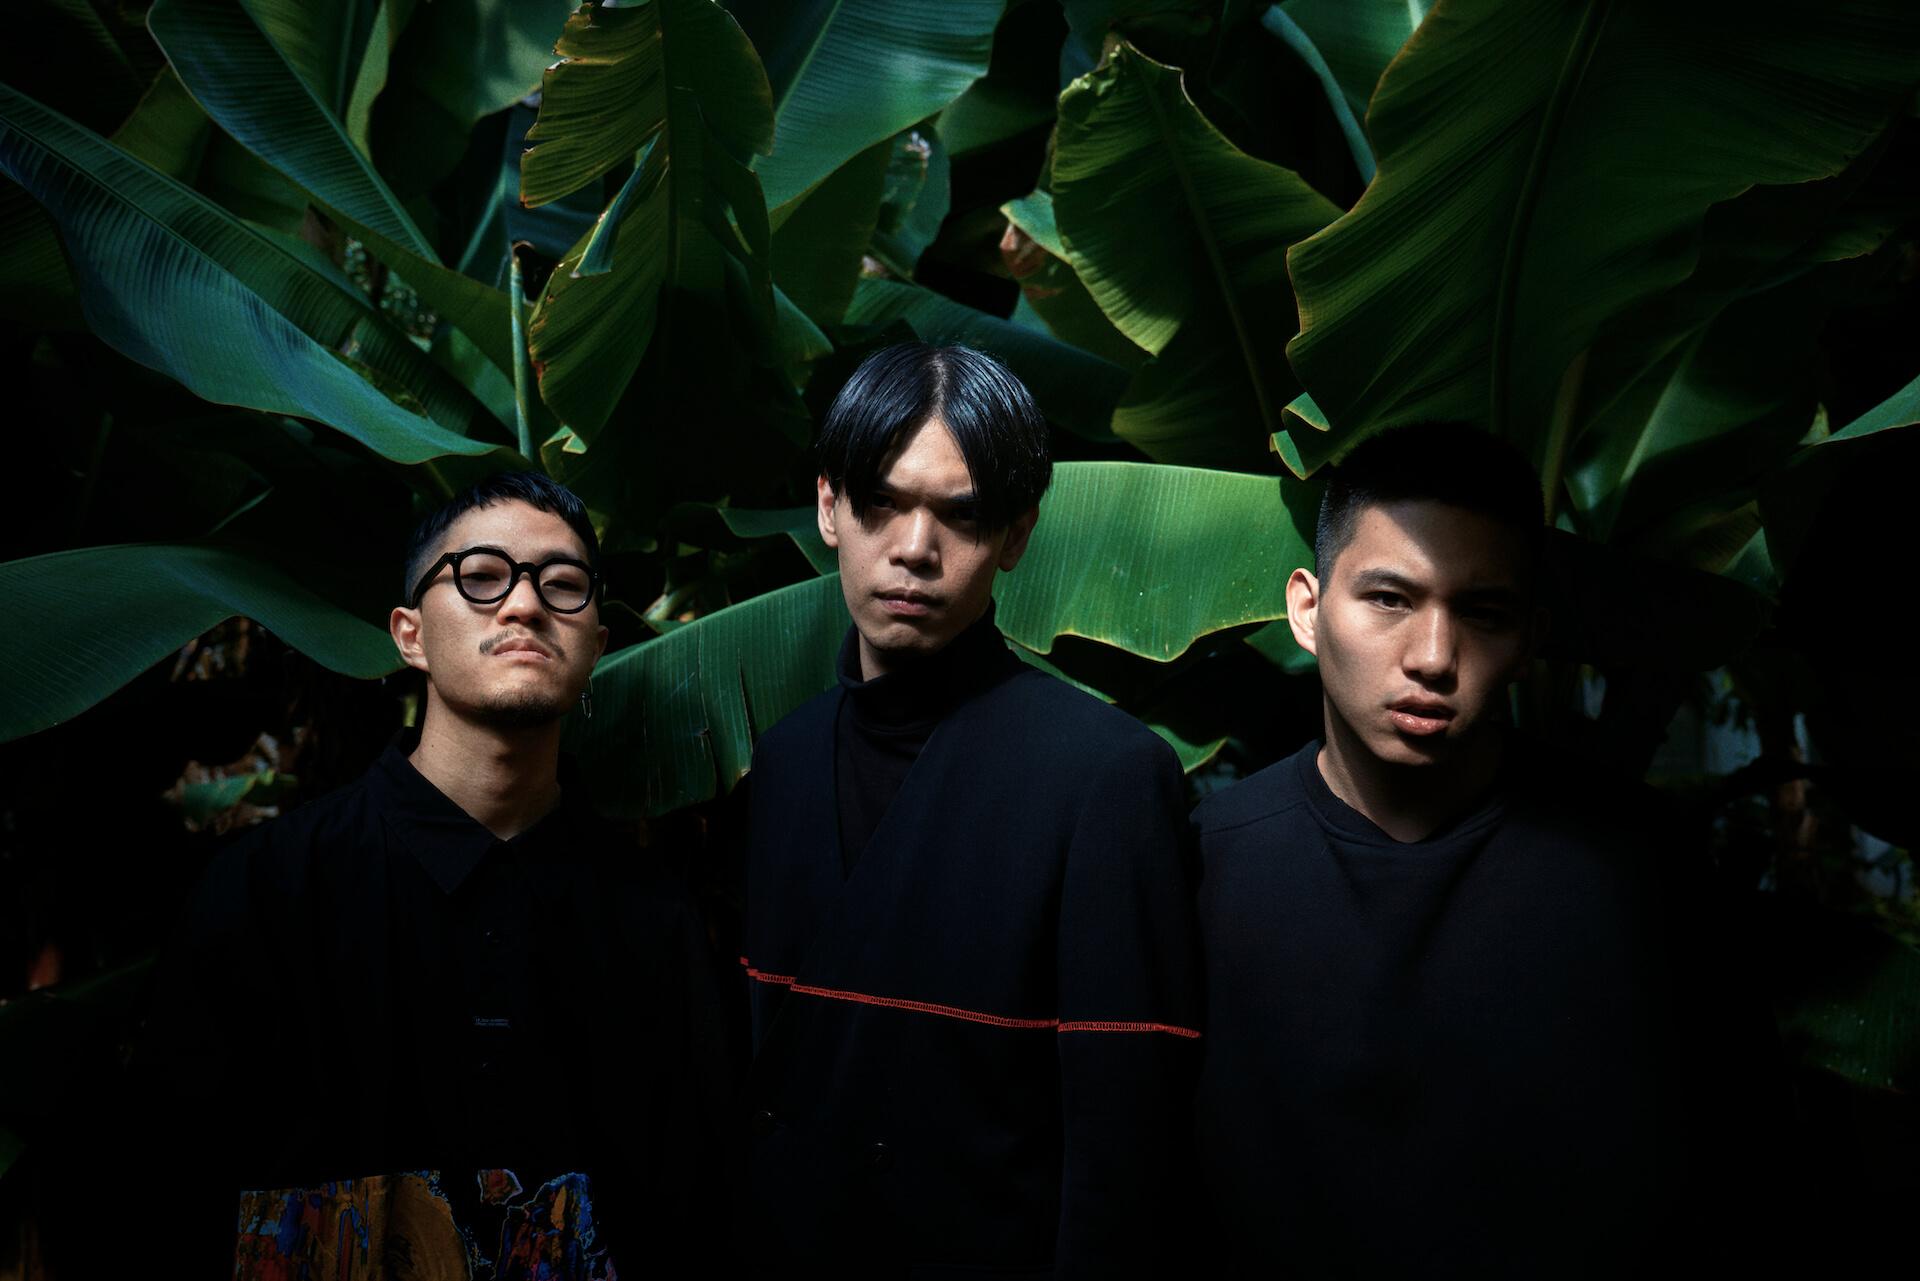 Dos MonosとZoomgalsによる異色コラボが実現!<D€TOX>が渋谷WWWで開催決定 music210413_dosmonos_zoomgals_3